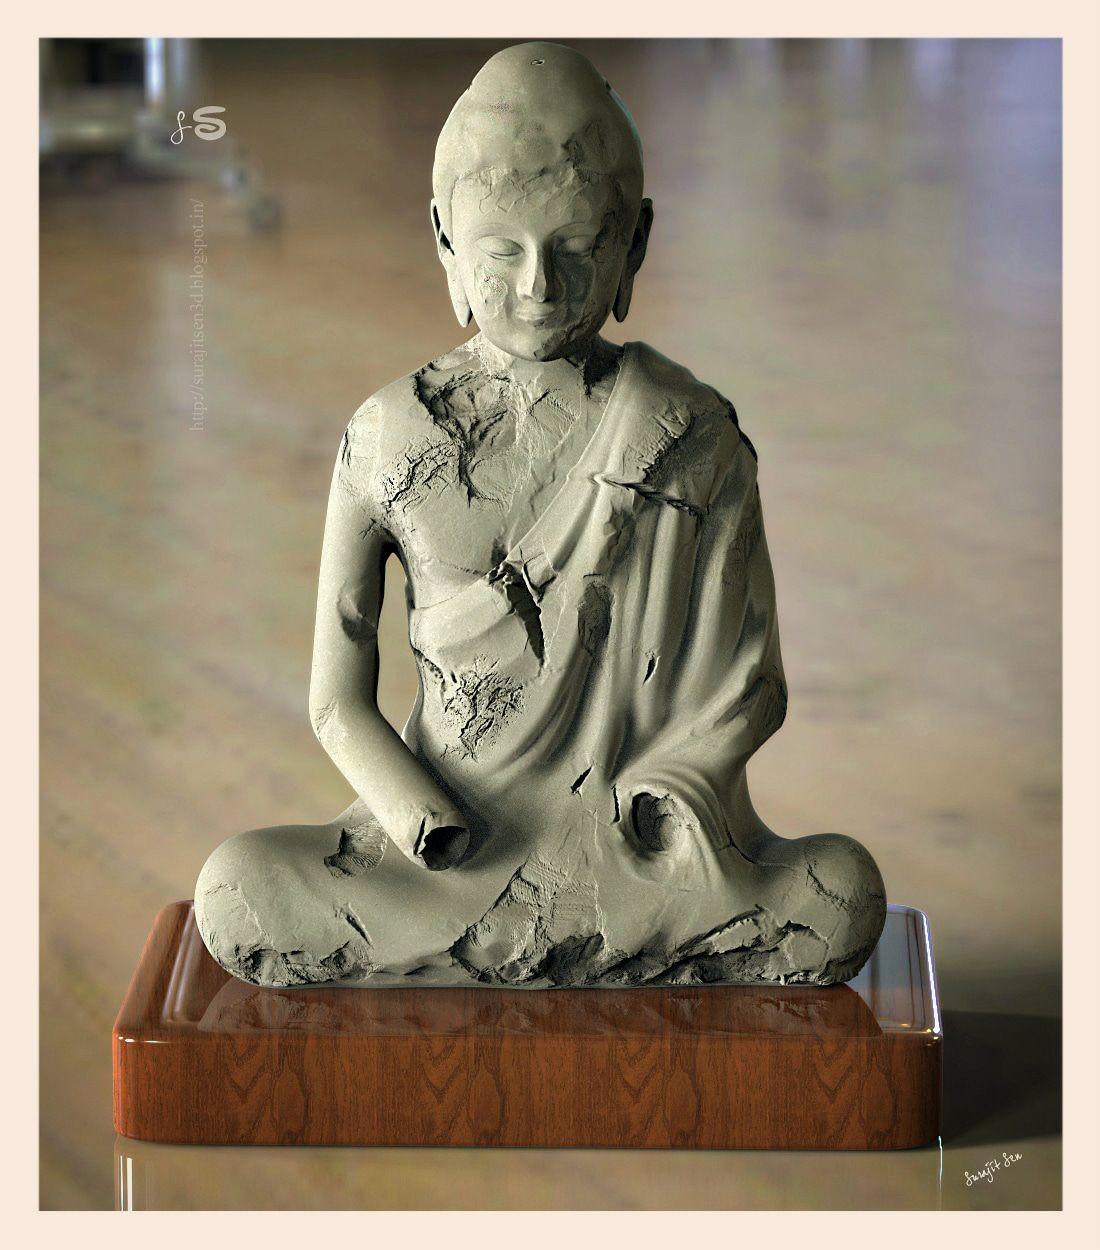 Surajit sen amitava sculpt by surajit sen insta